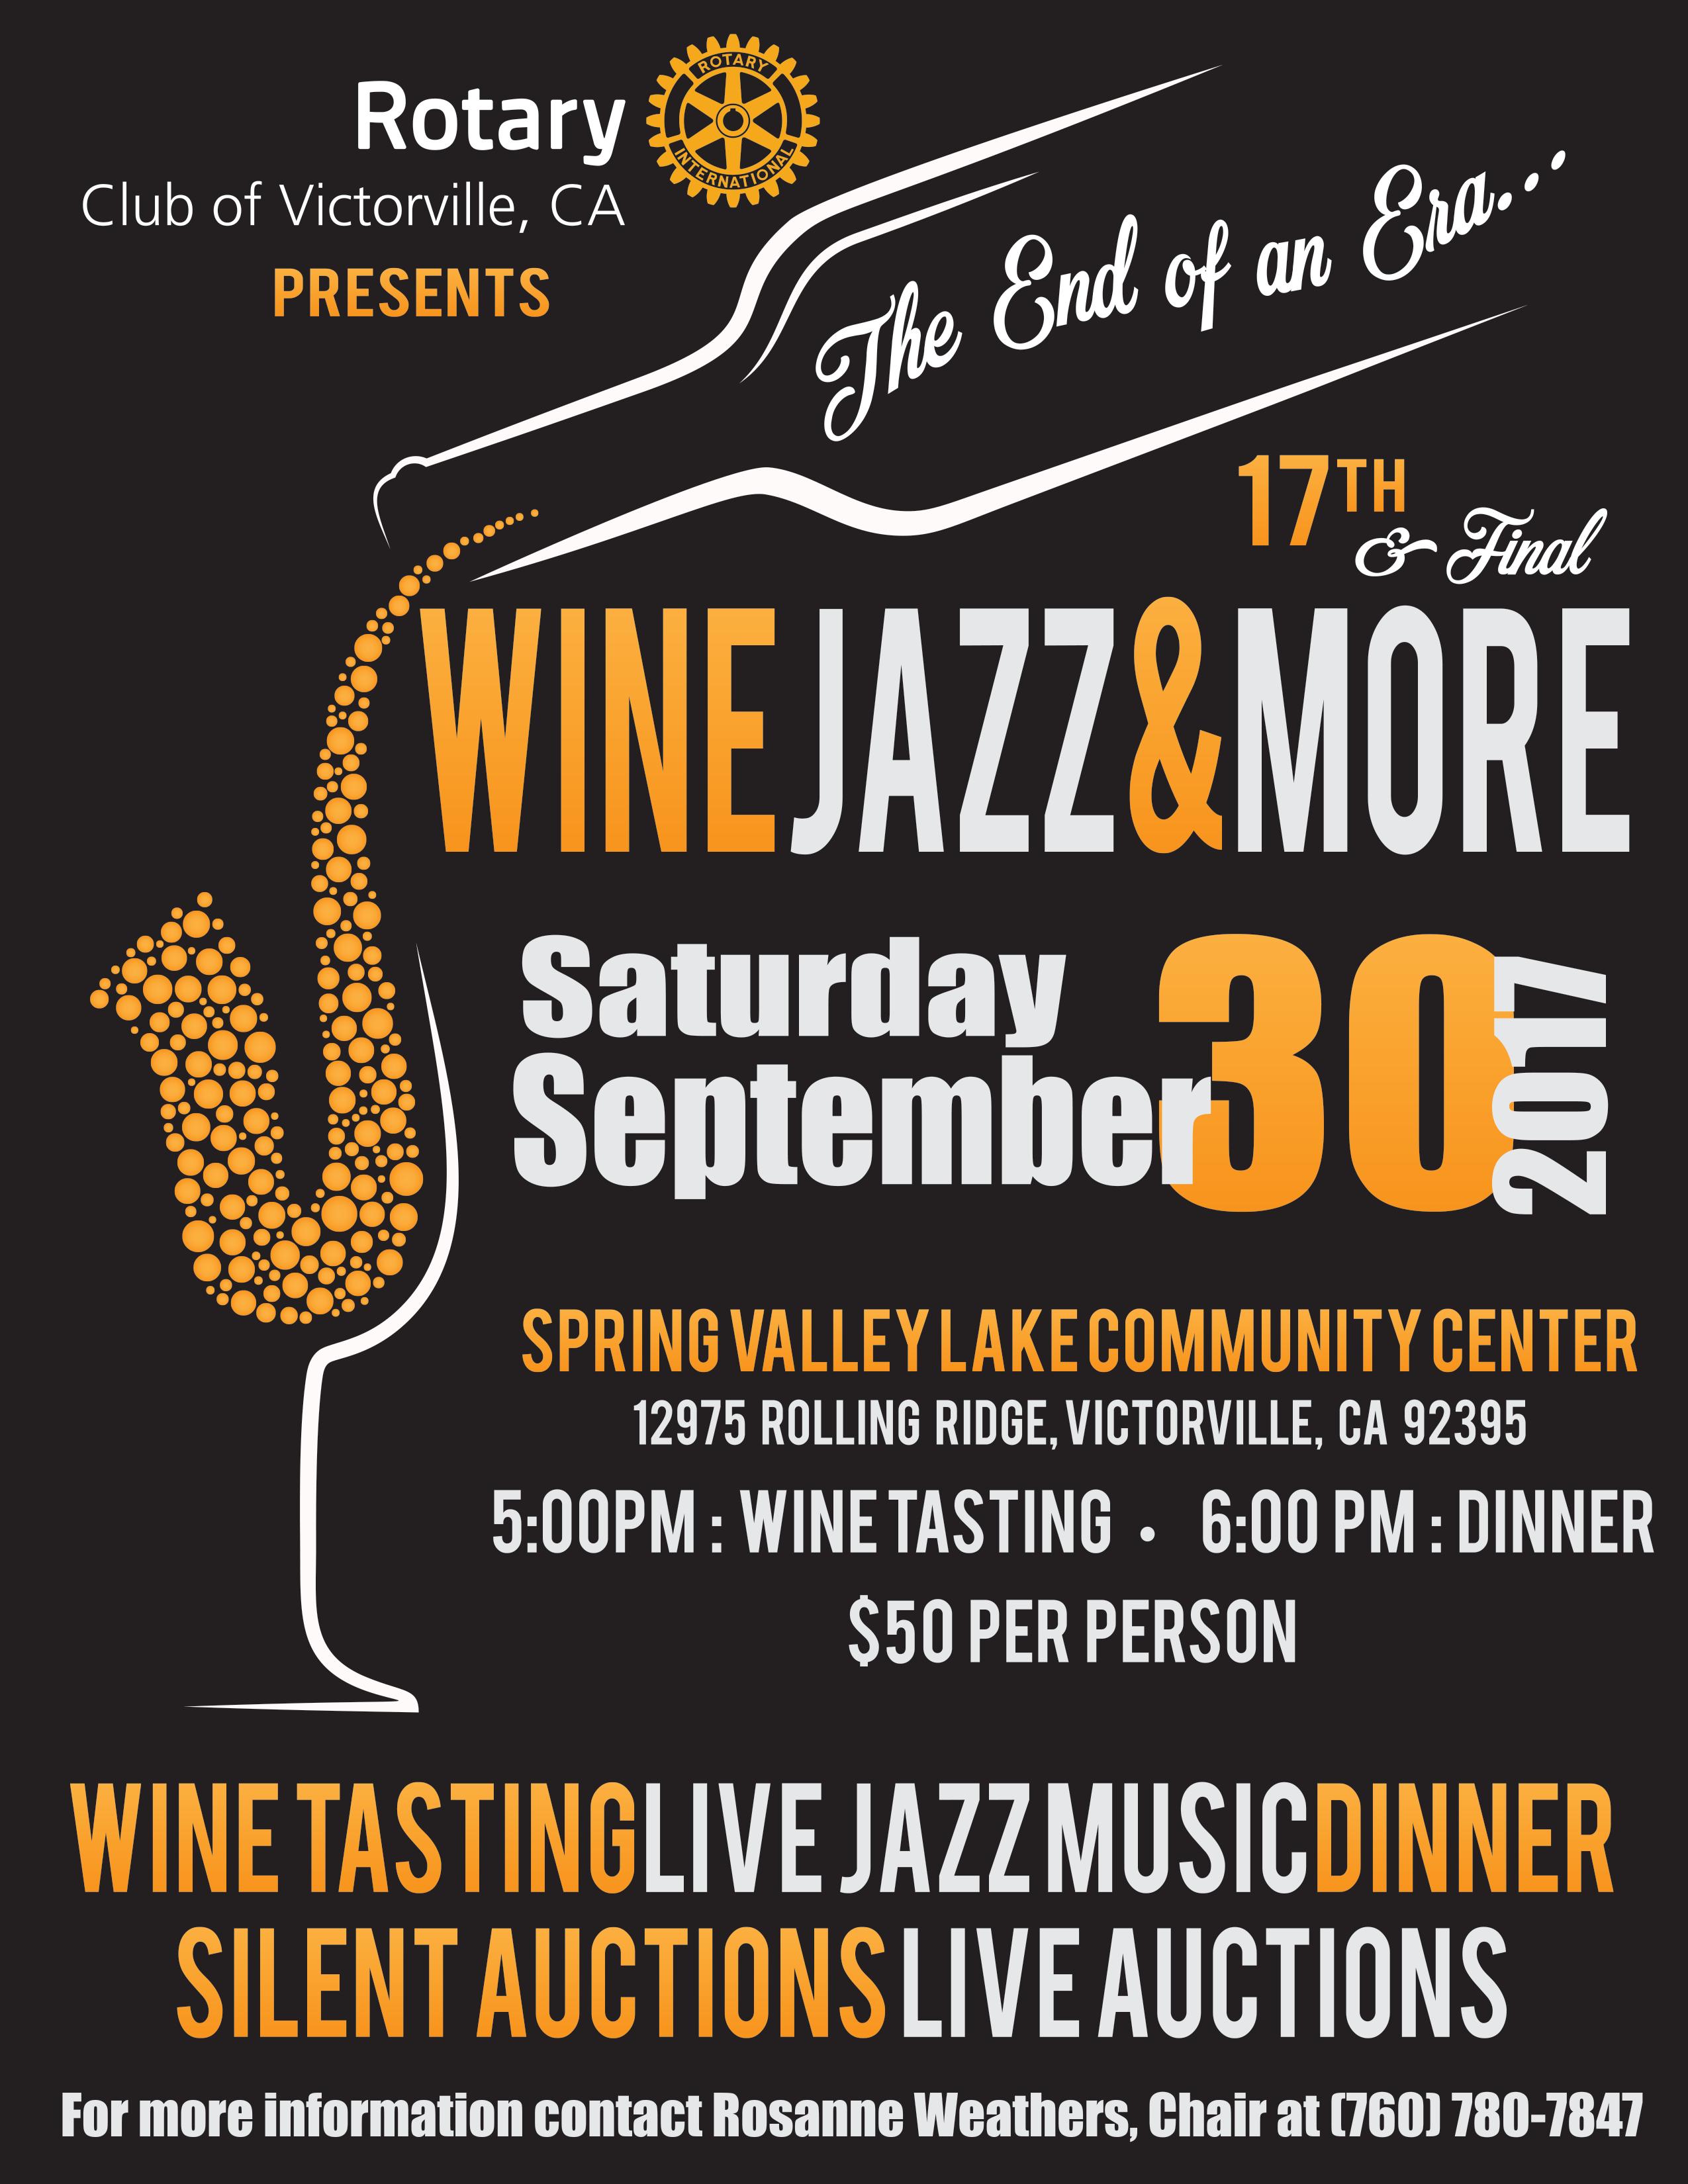 2017 Wine Jazz & More!